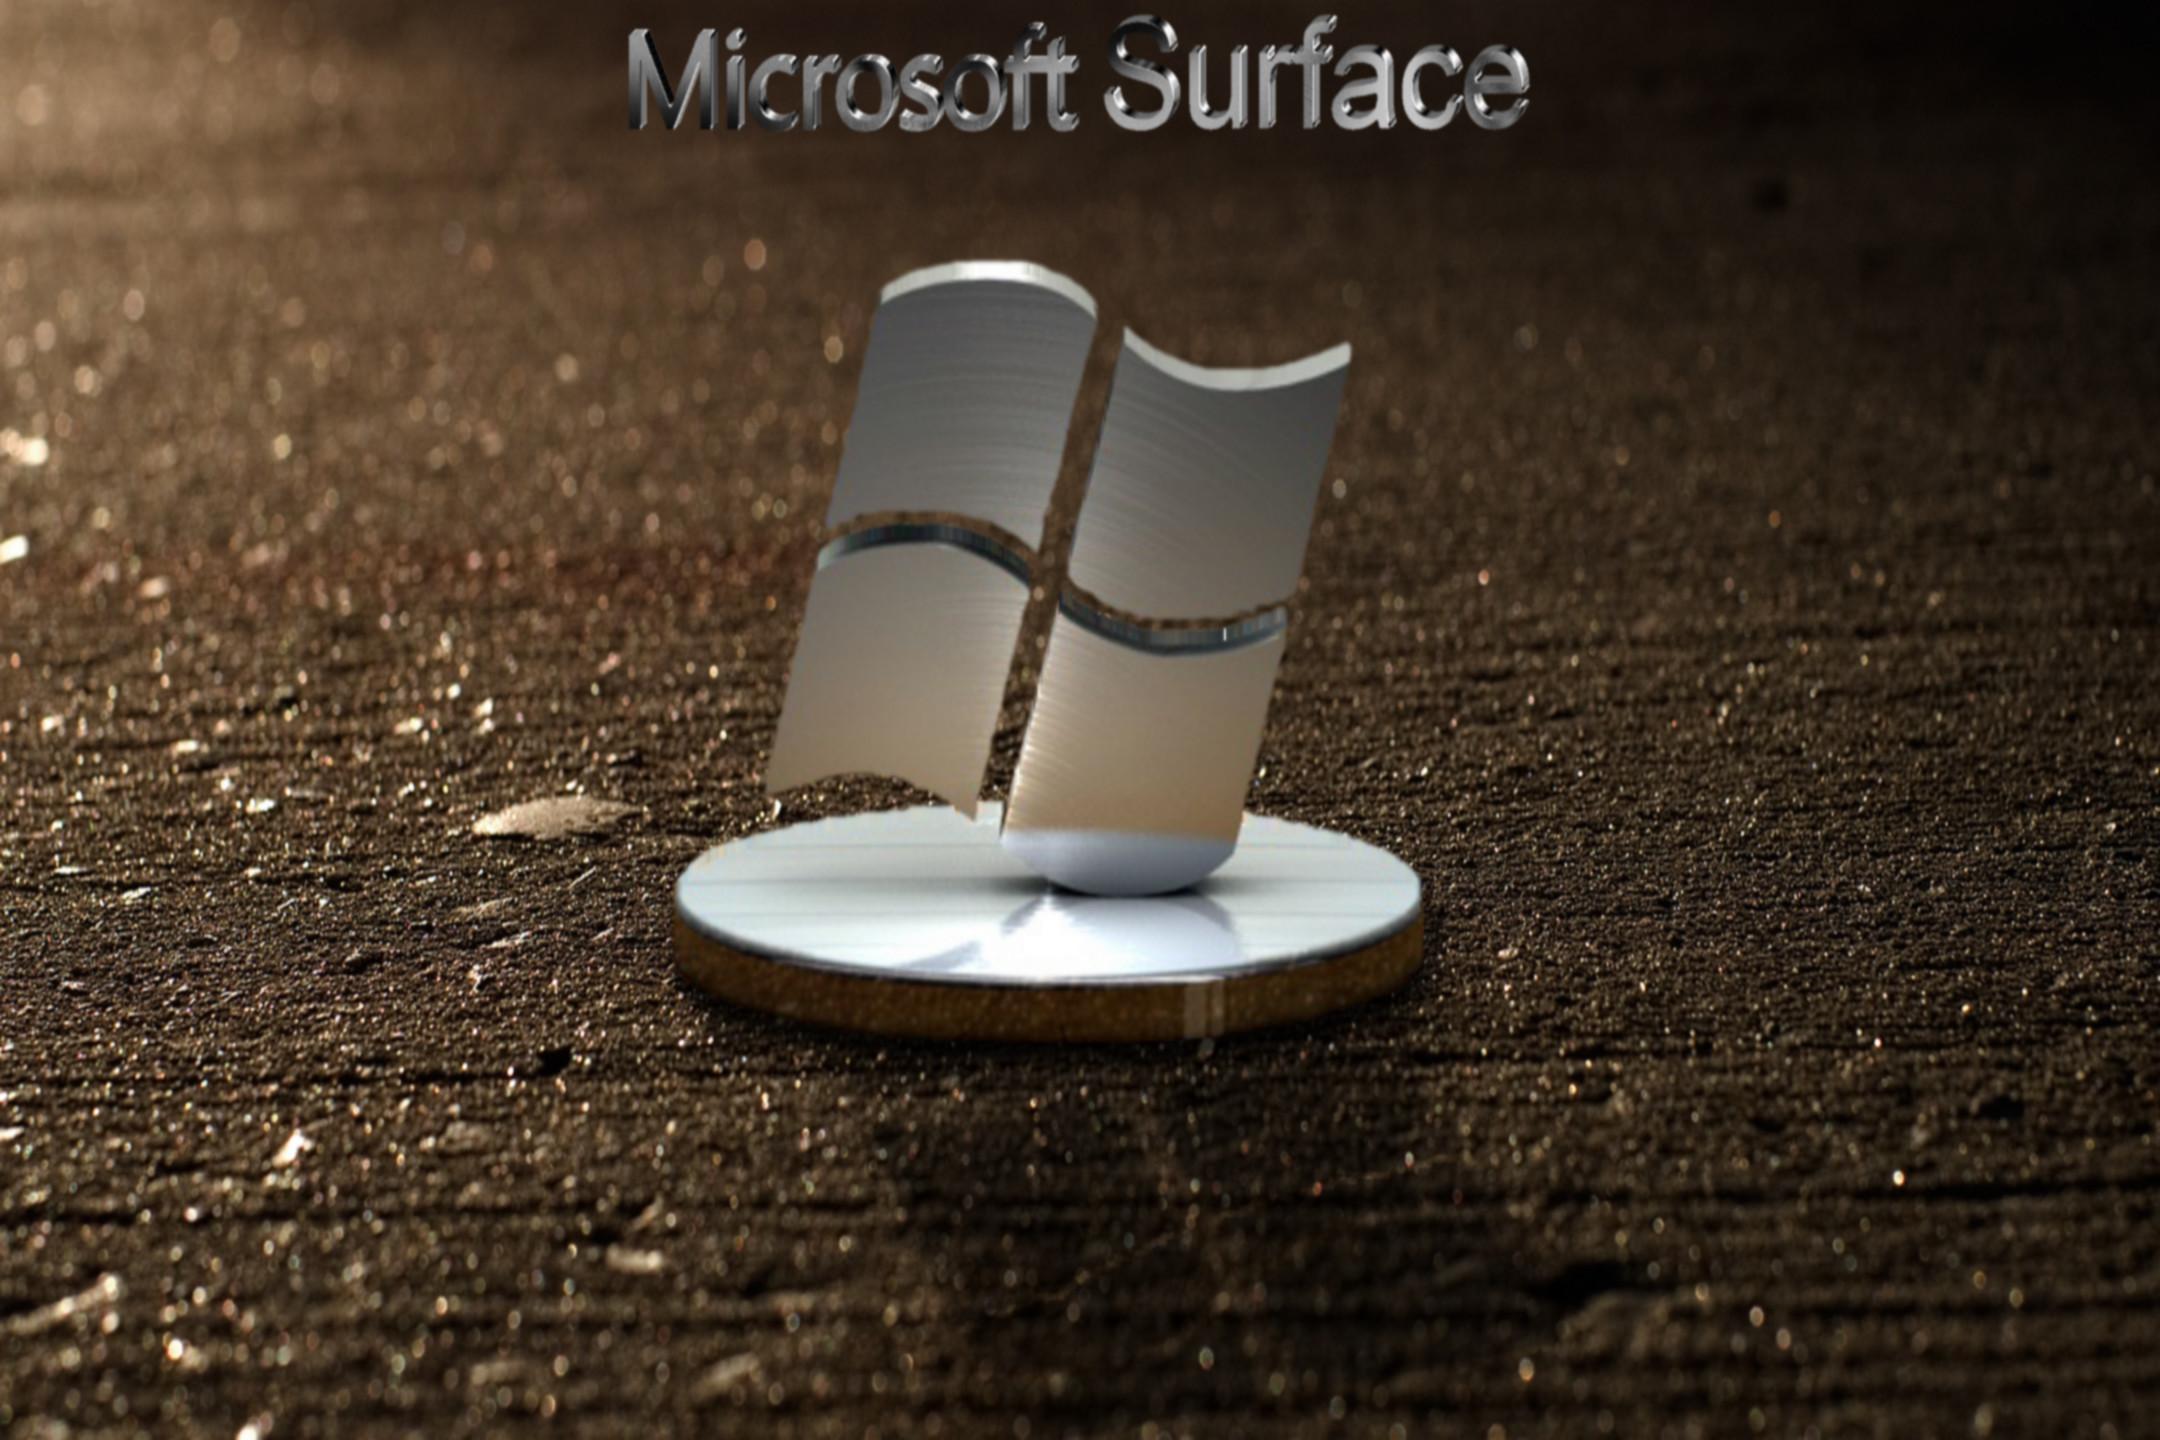 SP3 Microsoft Surface 2-dark concrete floor 2.png